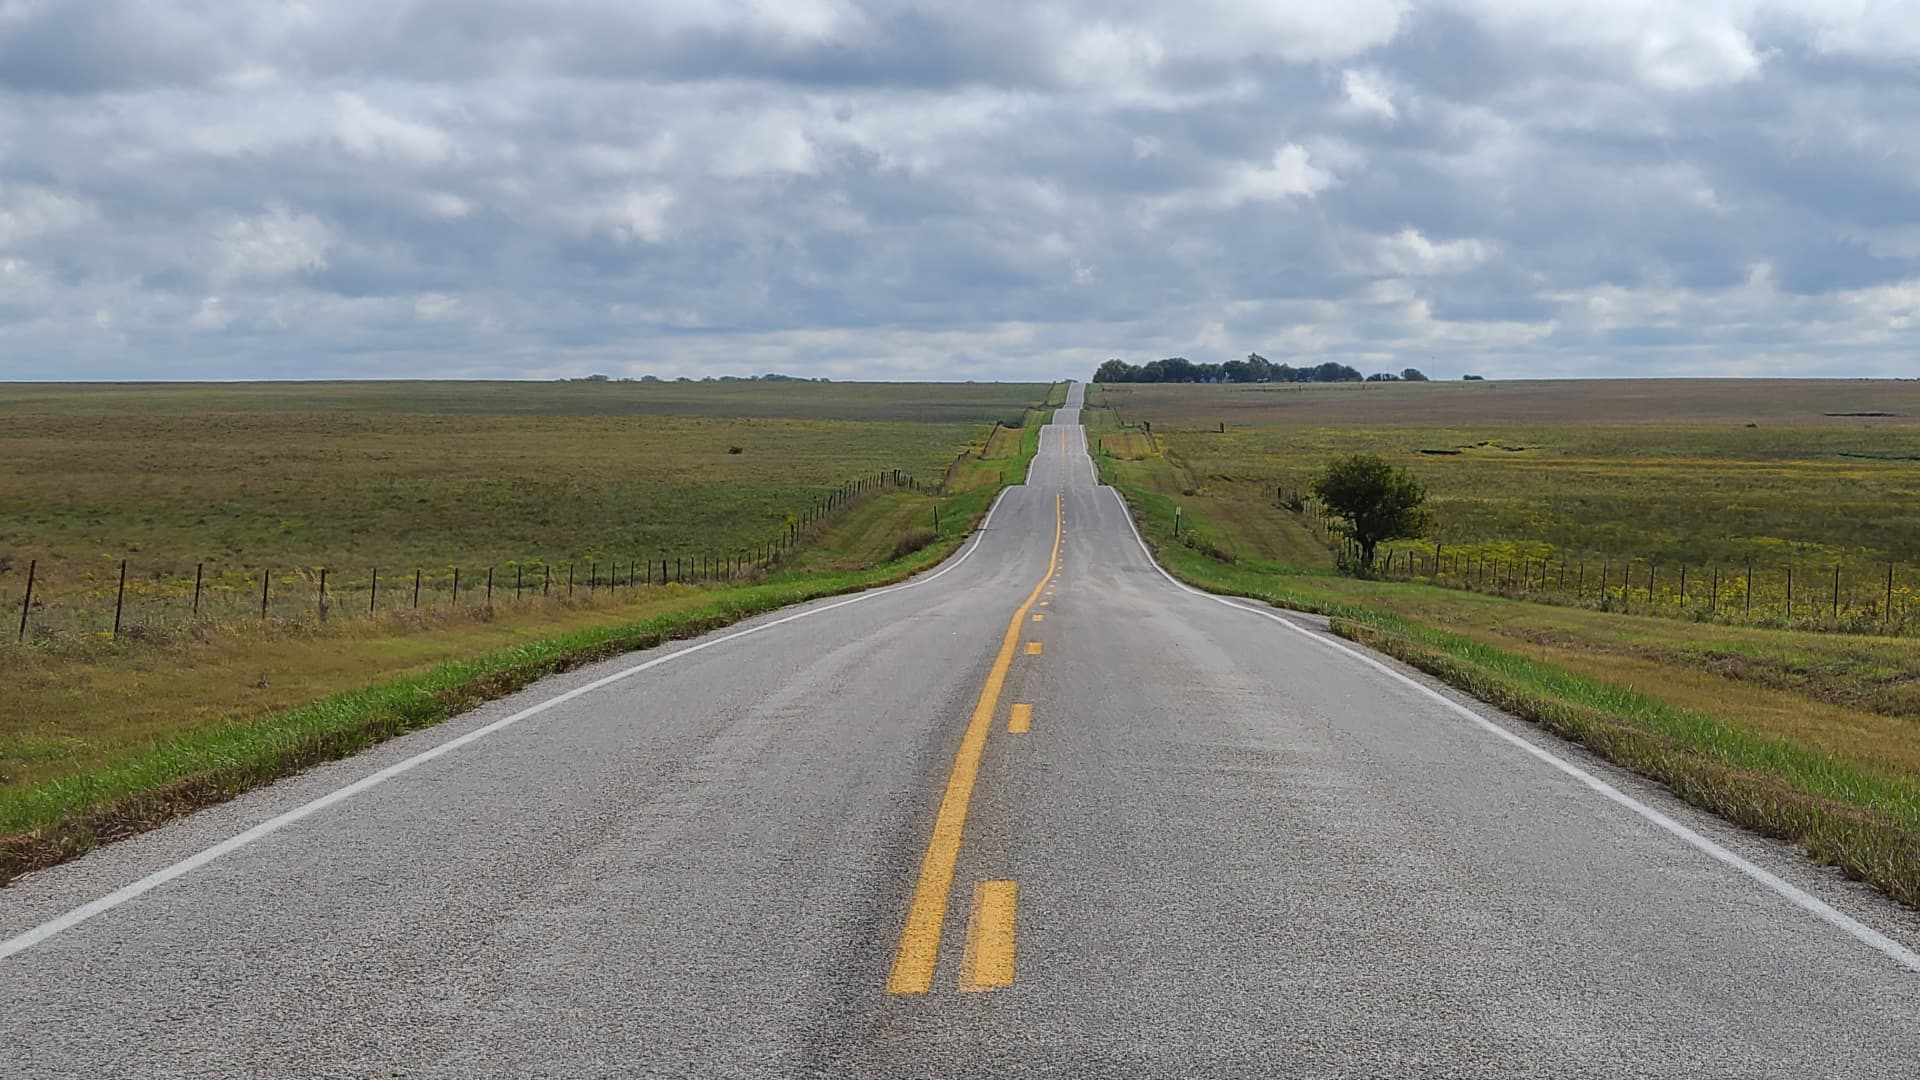 Miles of road in Kansas